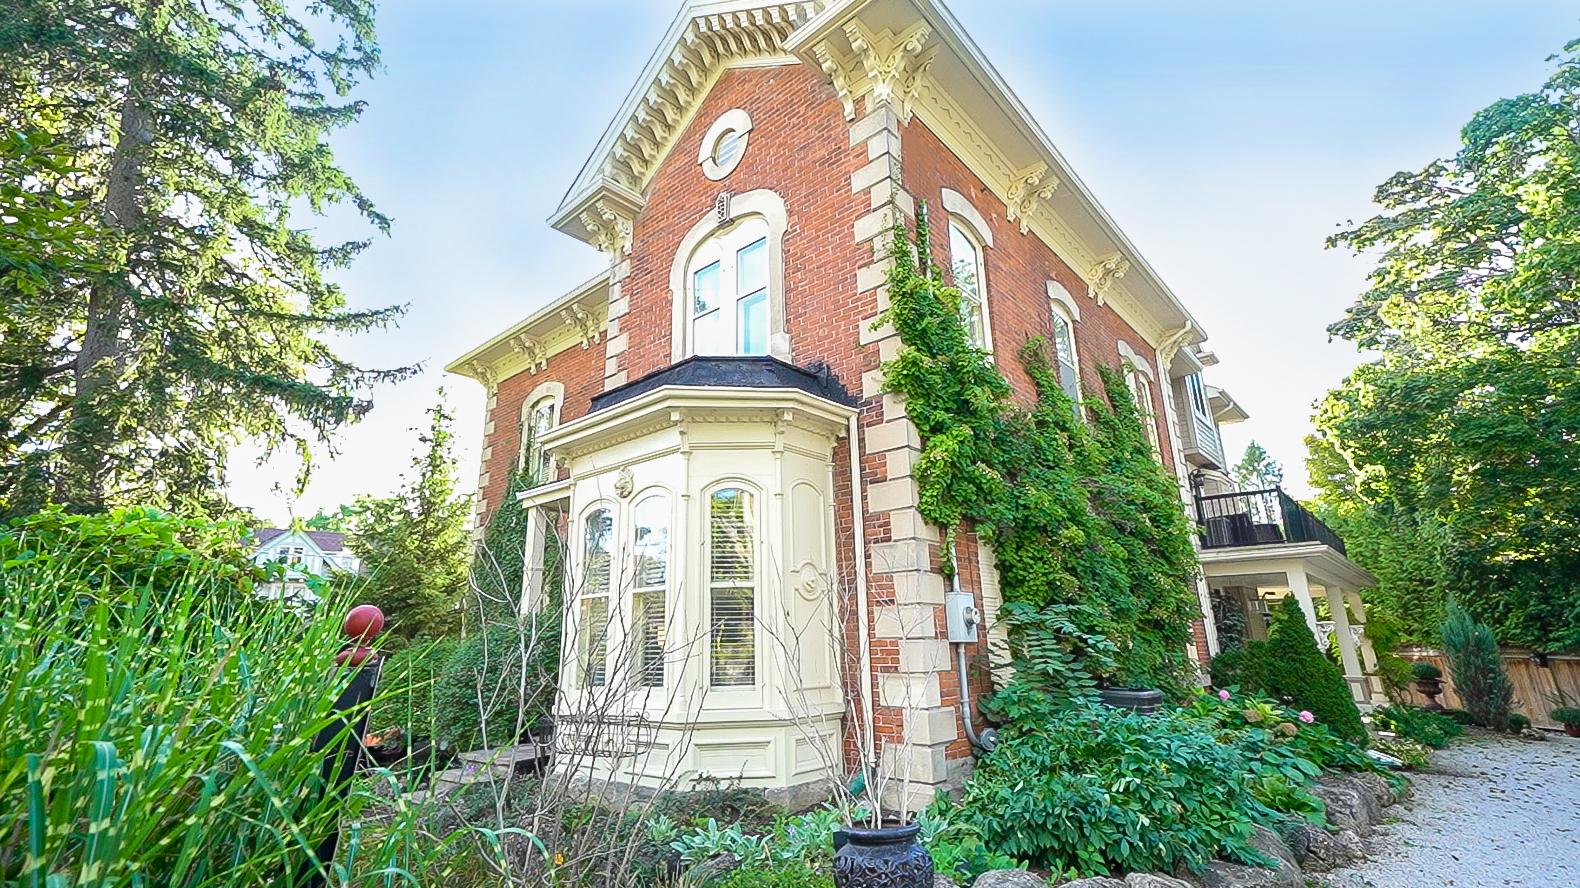 102 Eramosa Road Guelph Norfolk Guest House For Sale by Adam Stewart Realtor Chestnut Park West.jpg